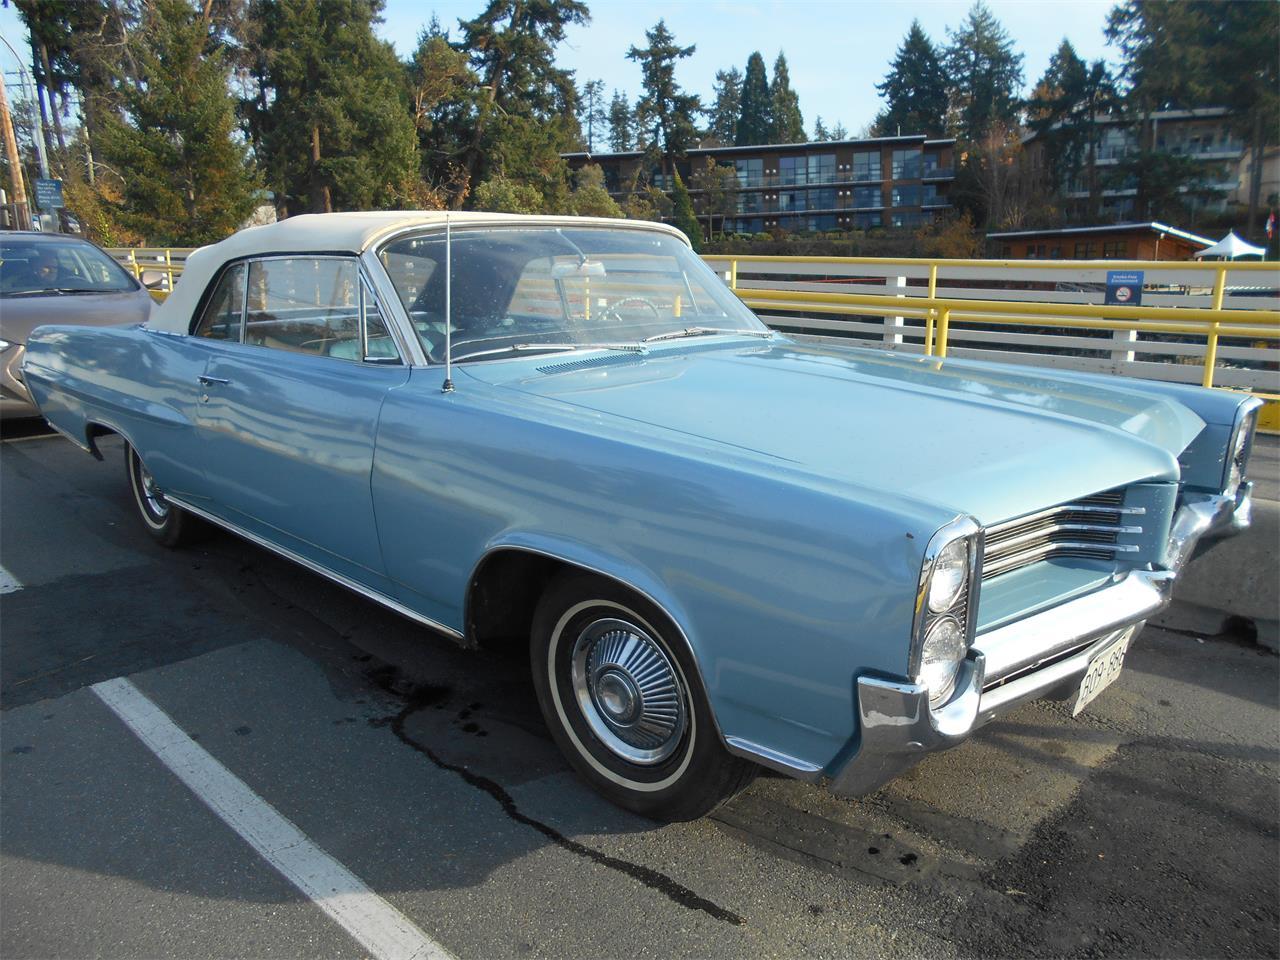 1964 Pontiac Parisienne For Sale Classiccars Com Cc 1162008